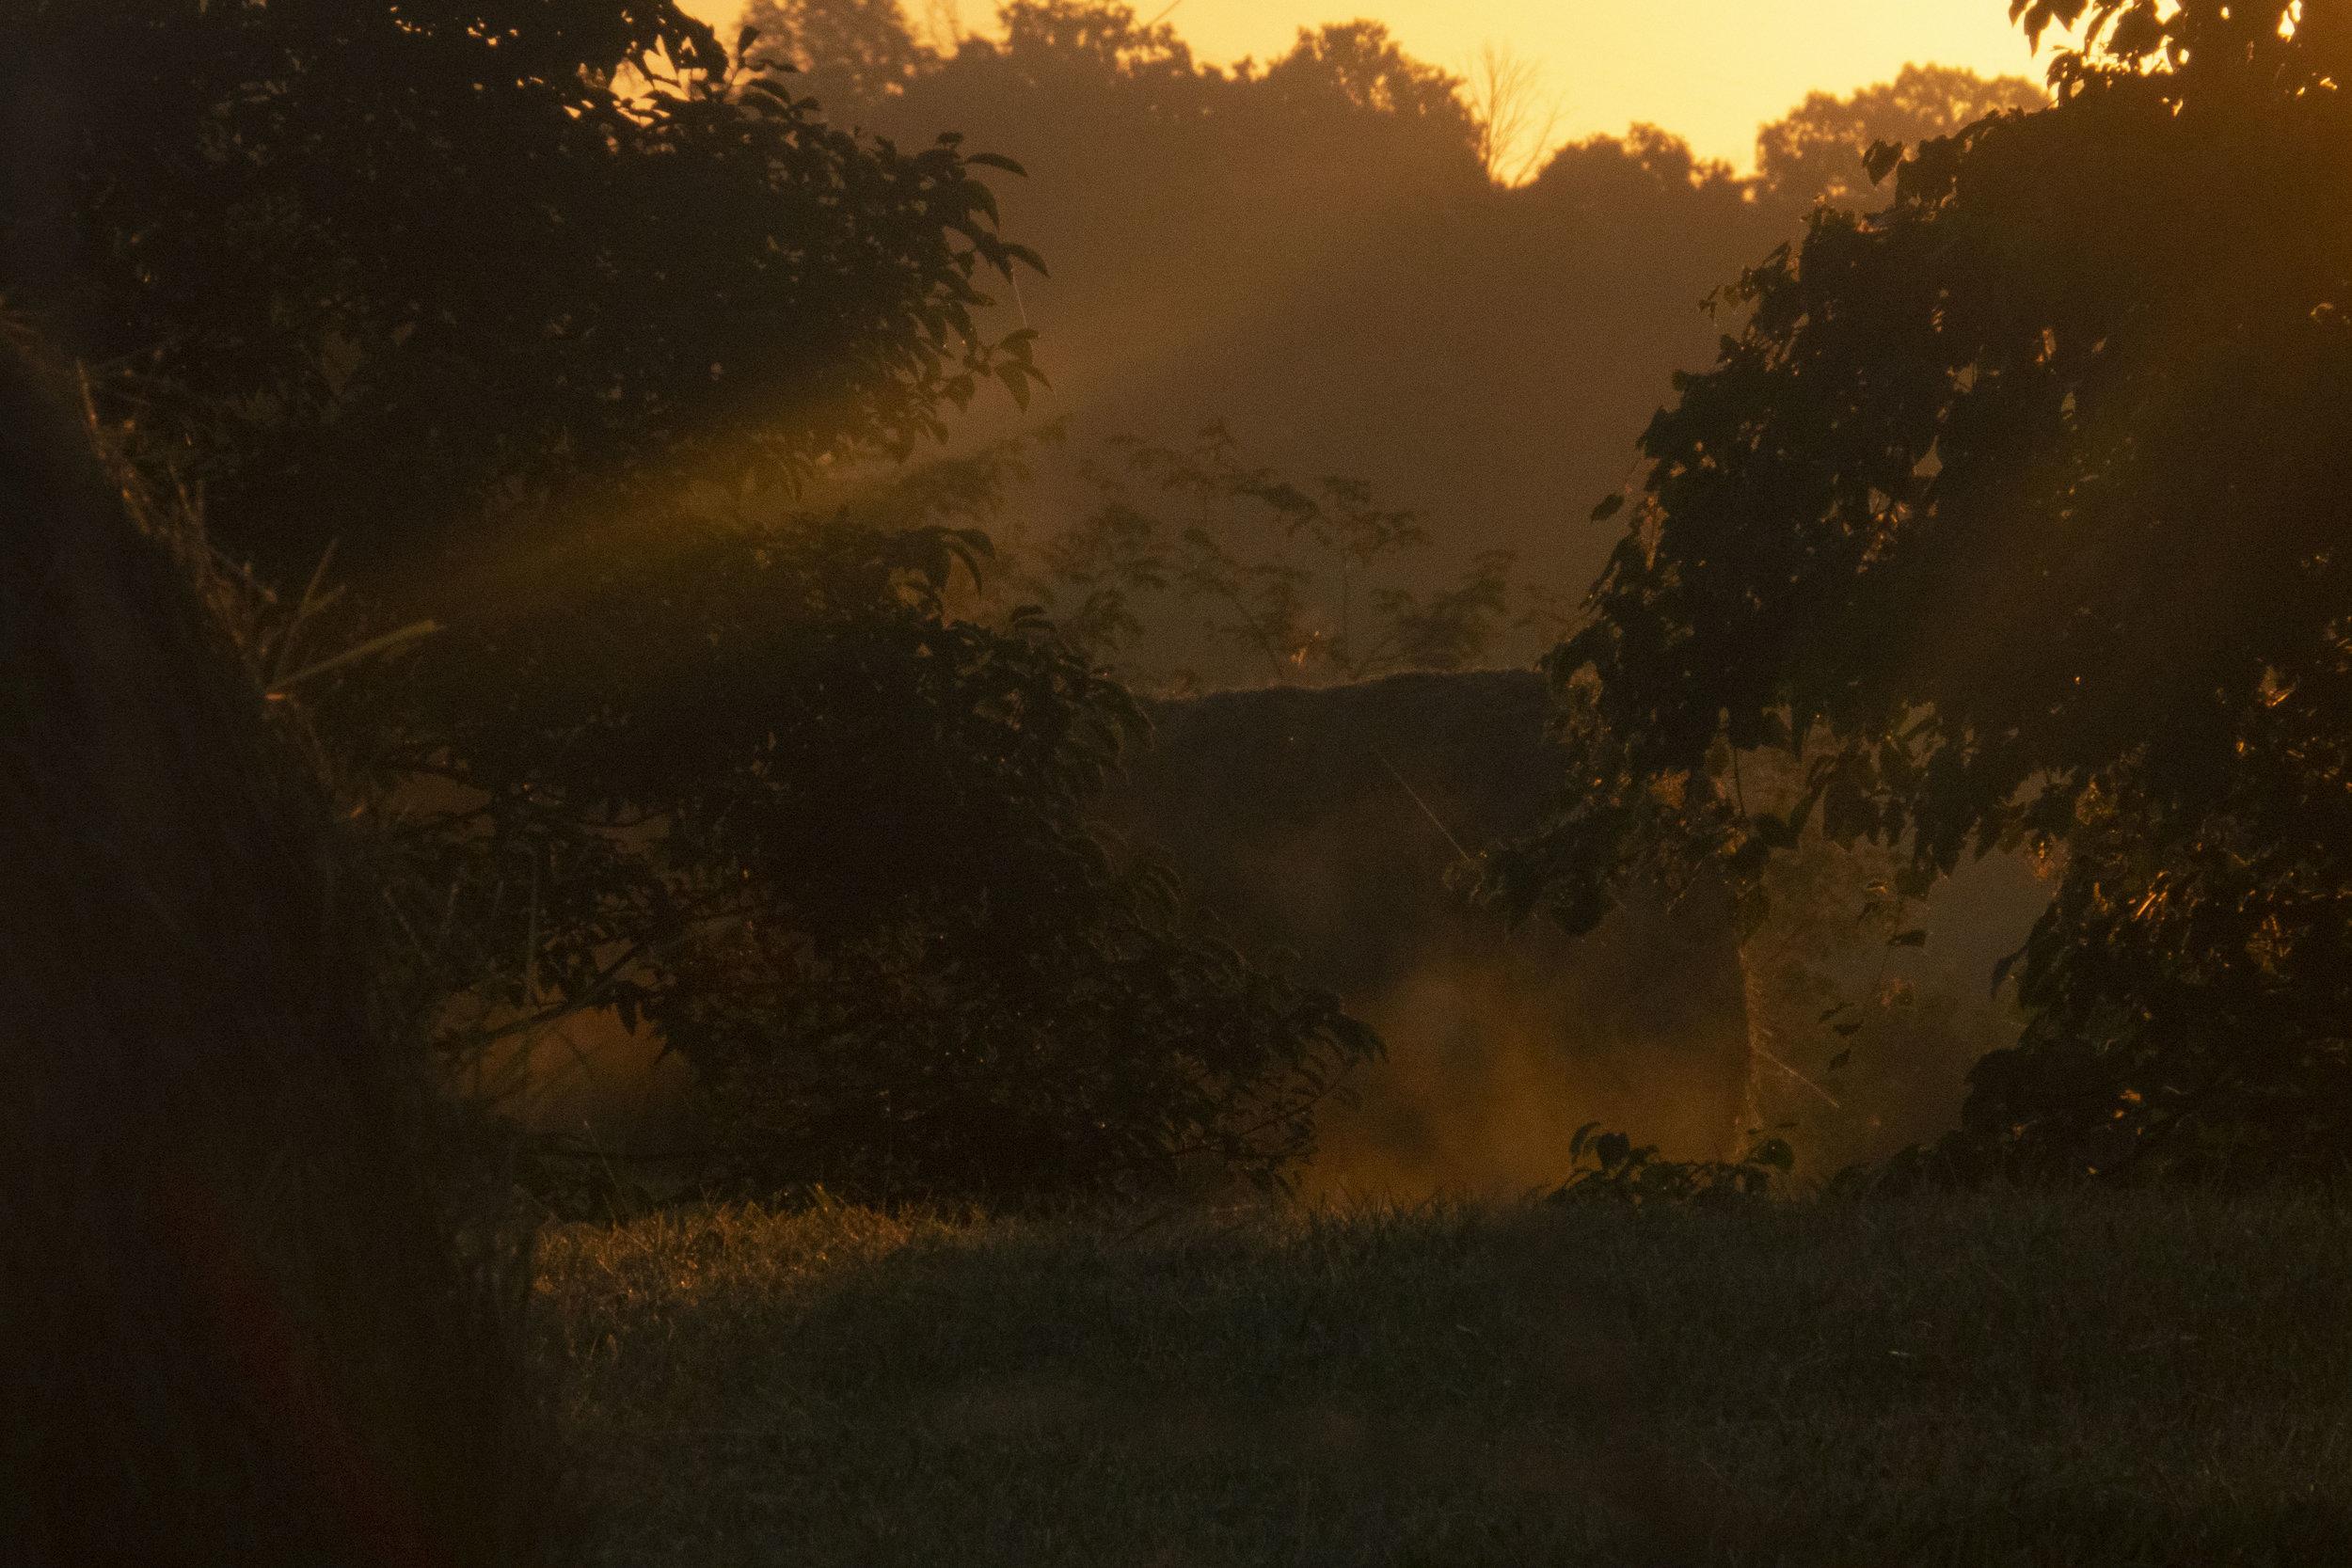 - Dawn to Dusk1 4.jpg